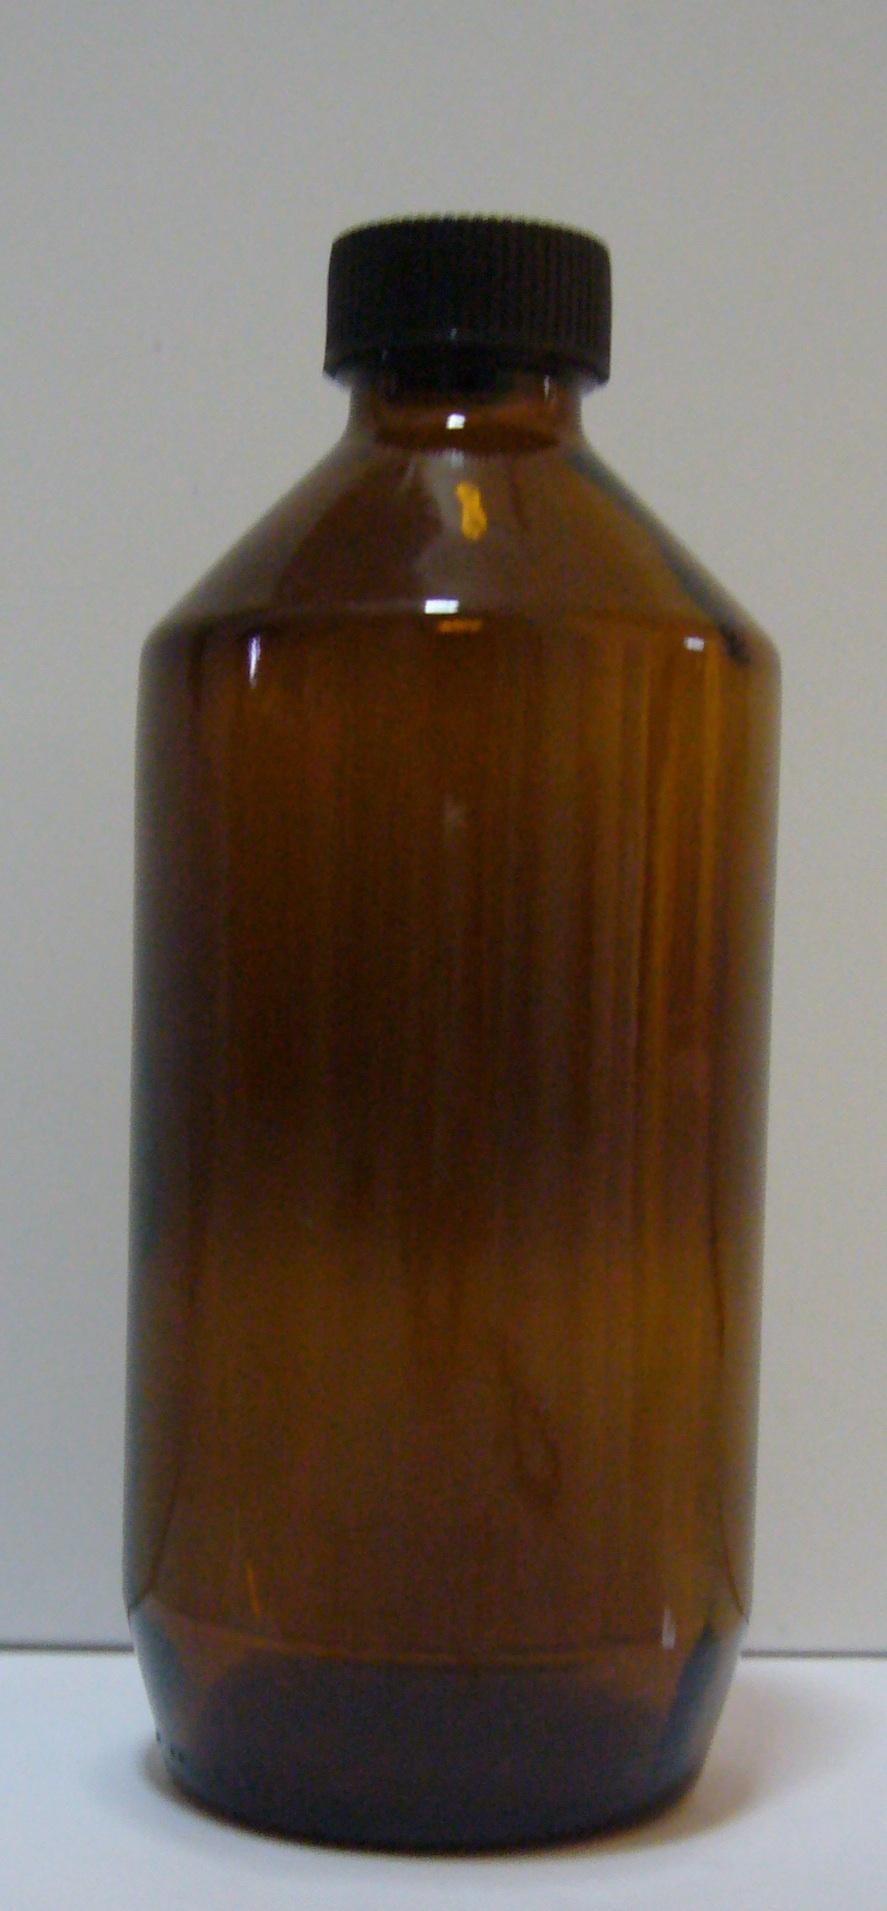 ea8b898d7e143 Amber glass bottle with plastic screw cap, 500mL